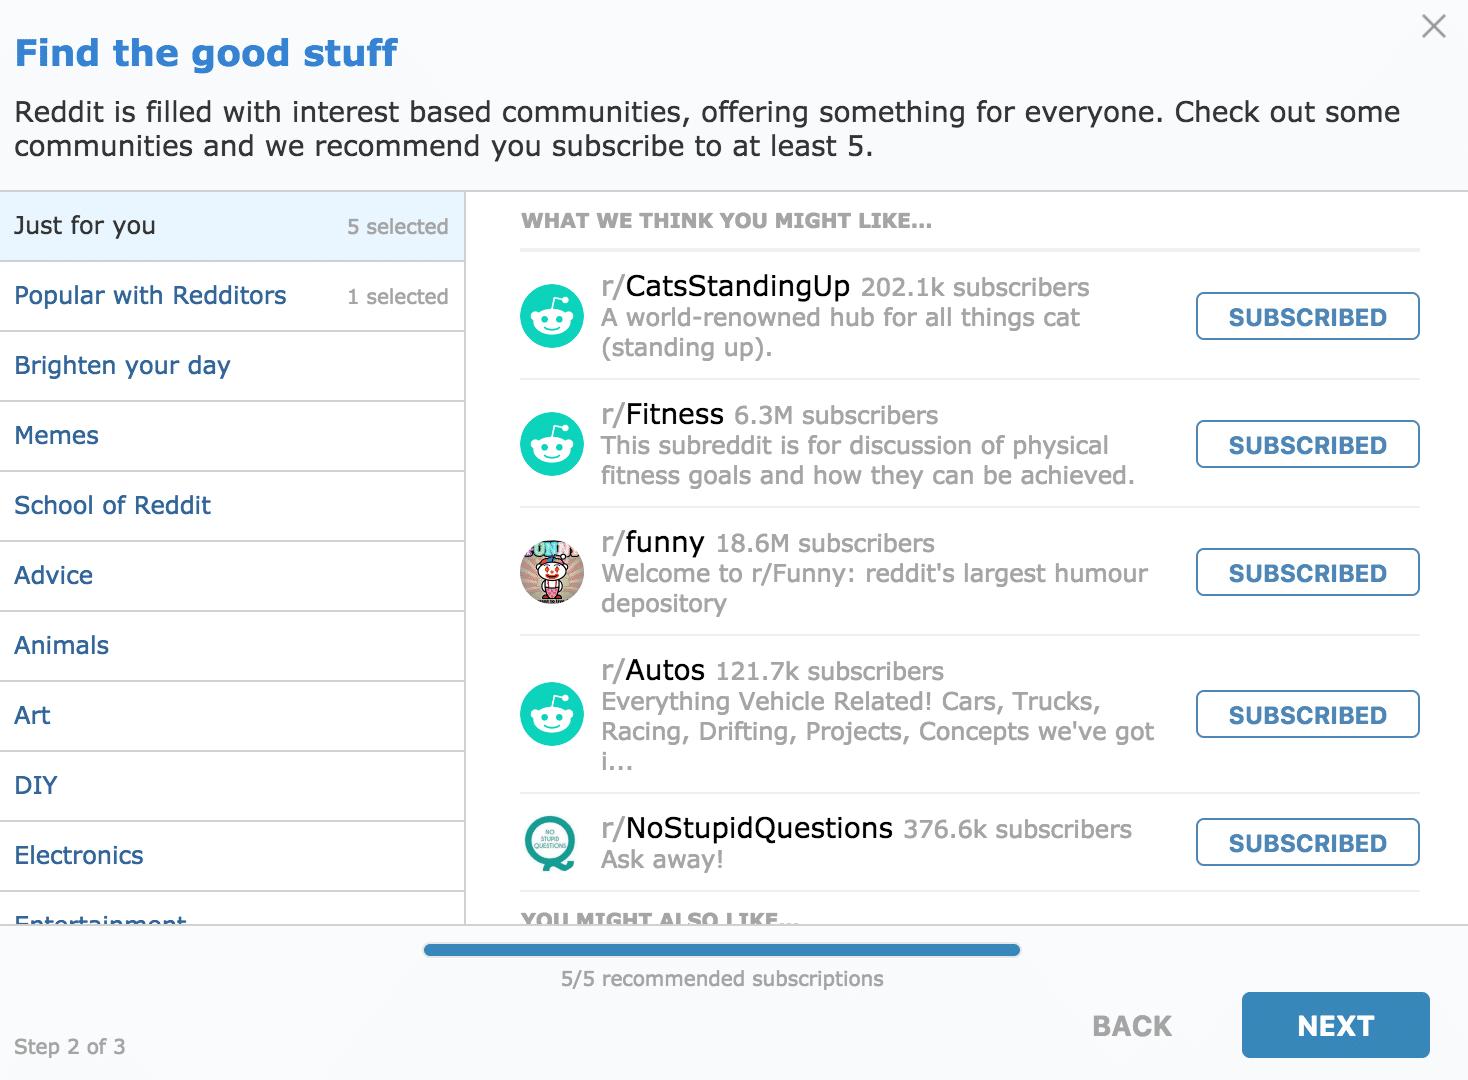 finding a good stuff on Reddit